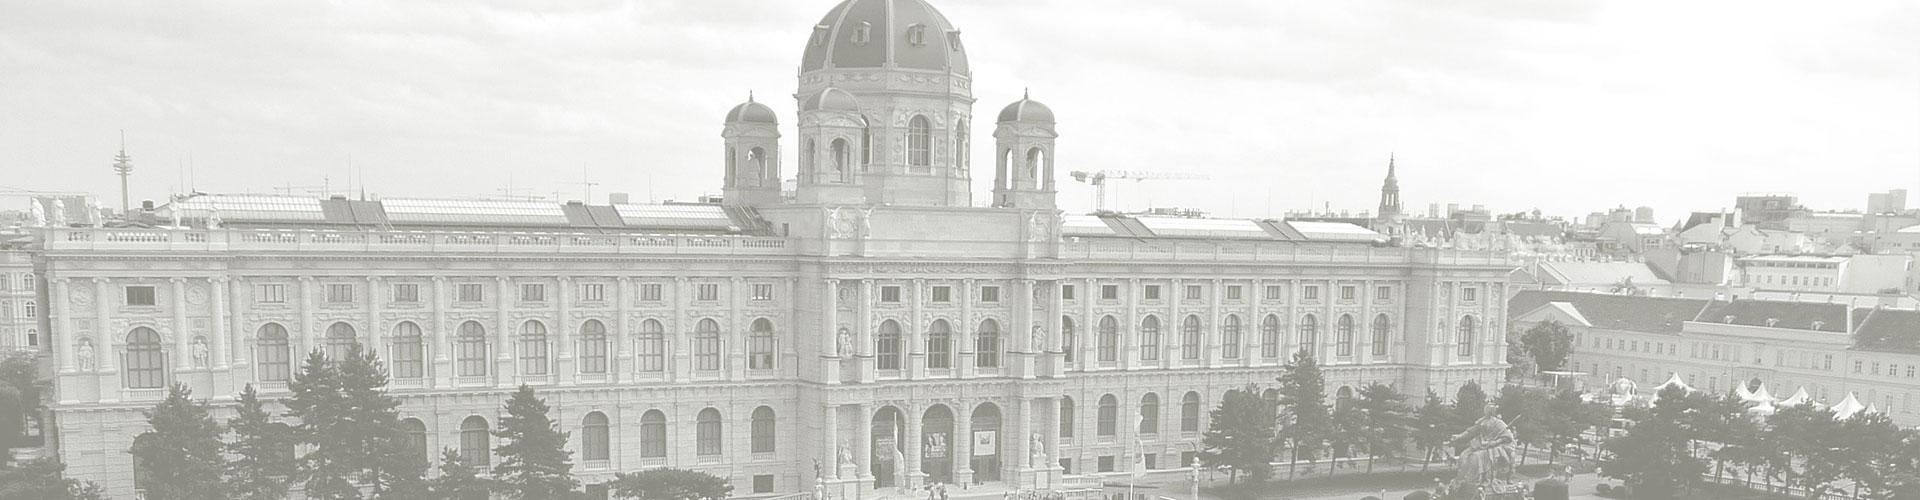 Visit PageSuite in Vienna this October!